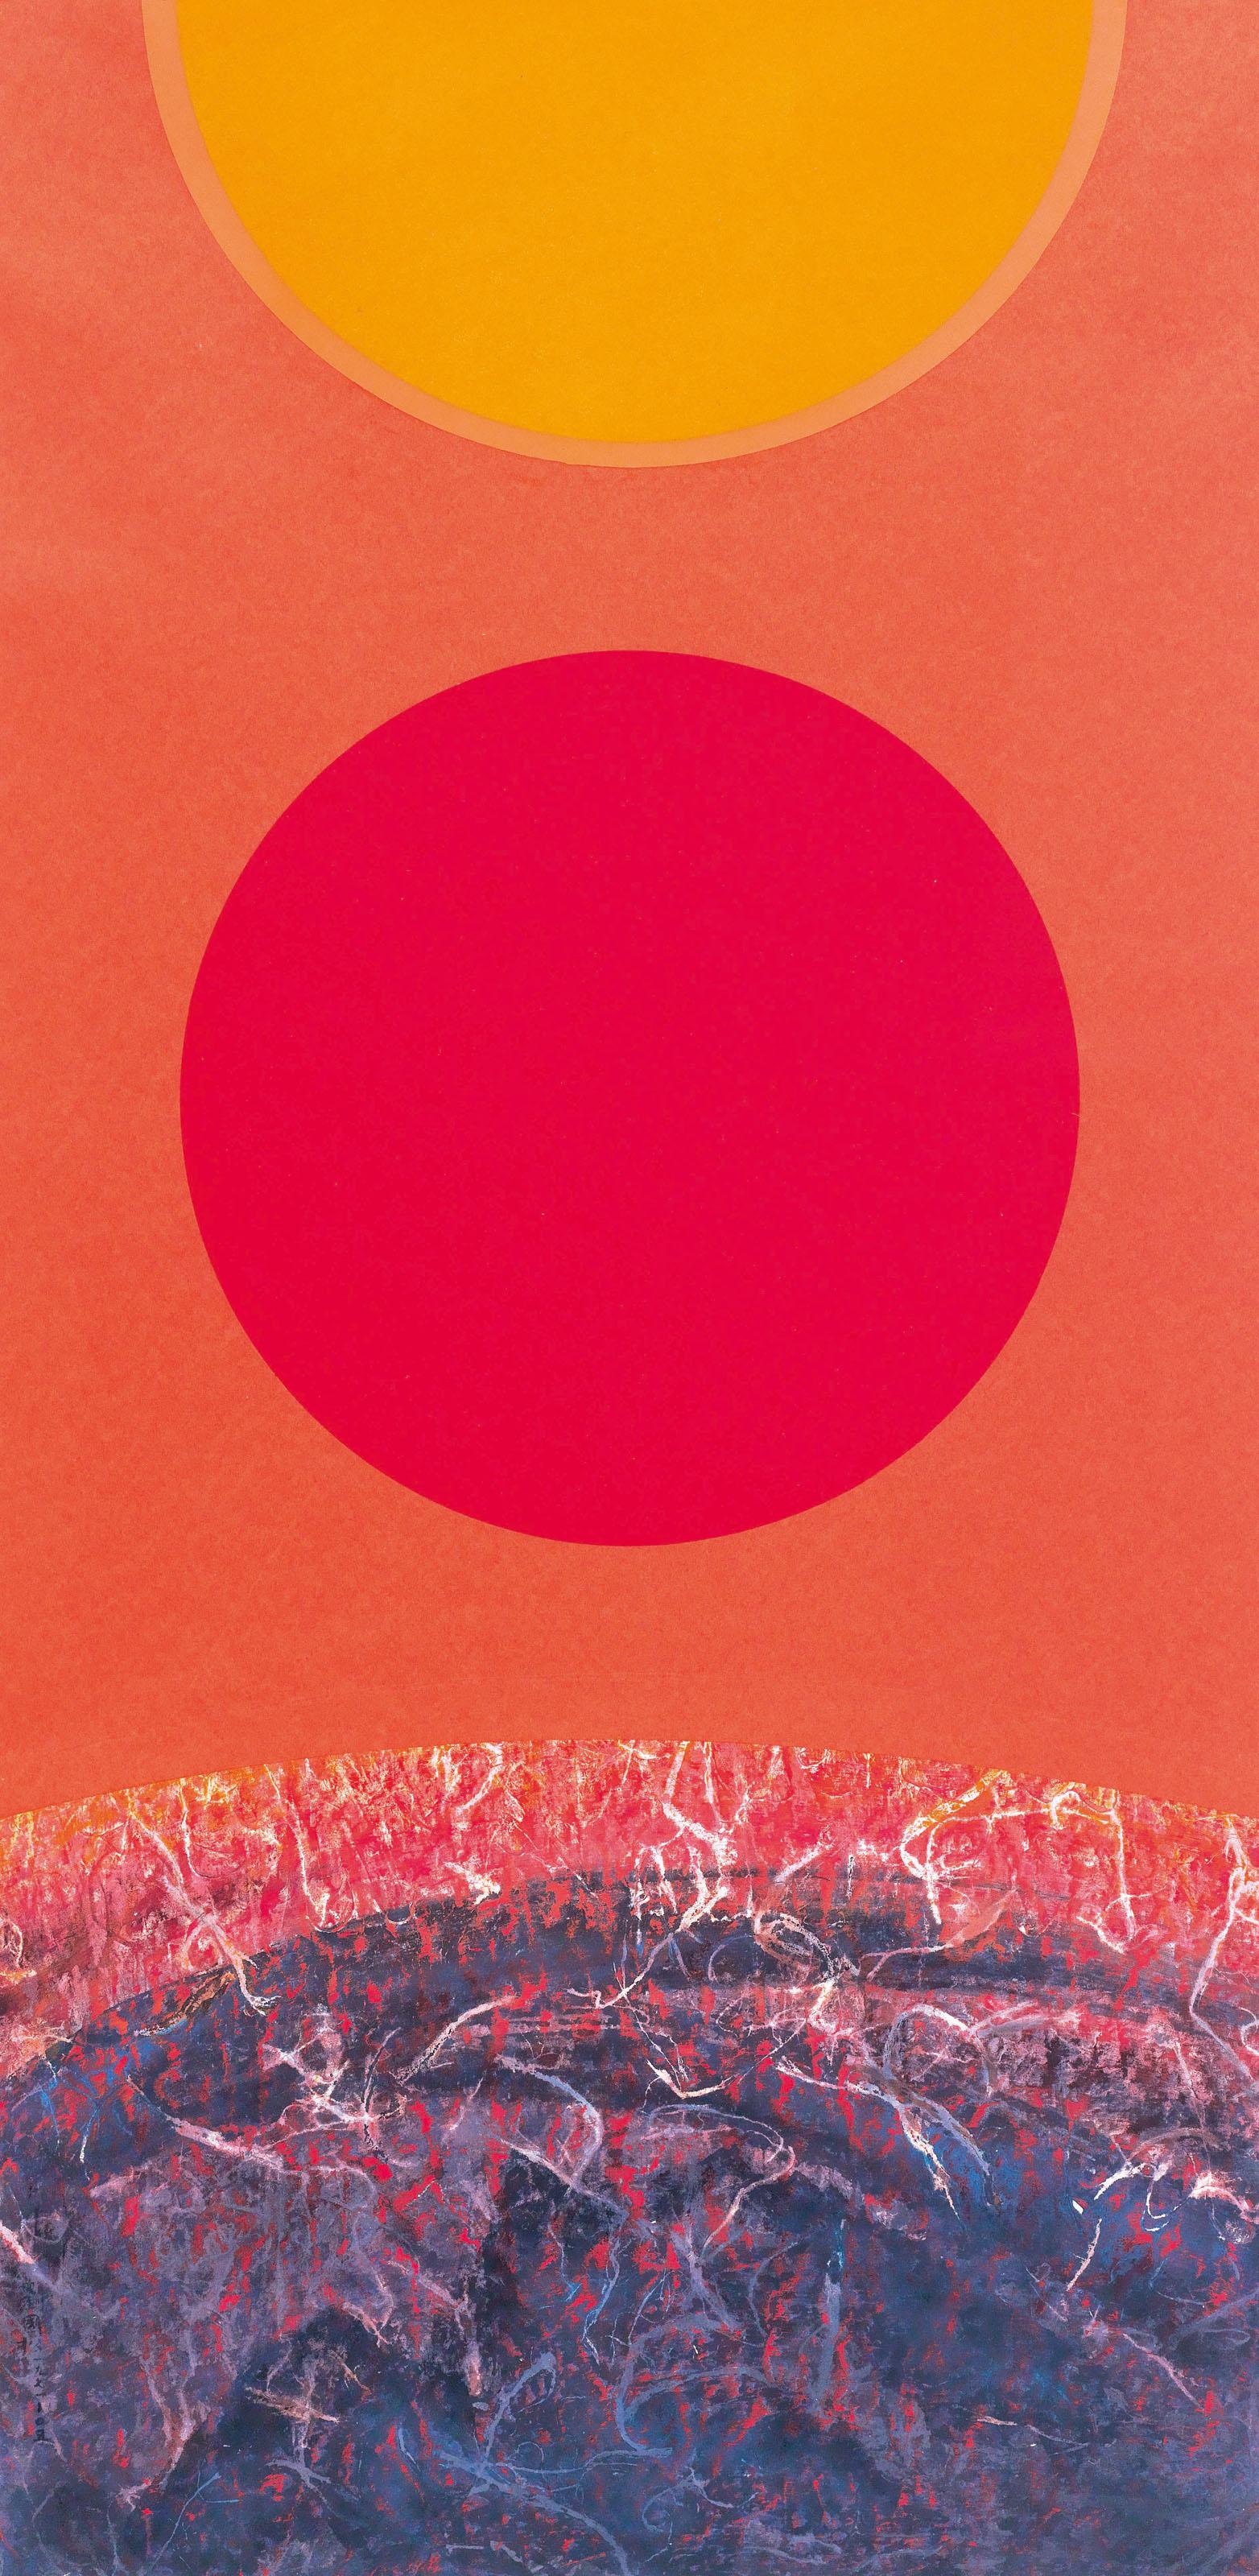 Metamorphosis of the Sun, No.7